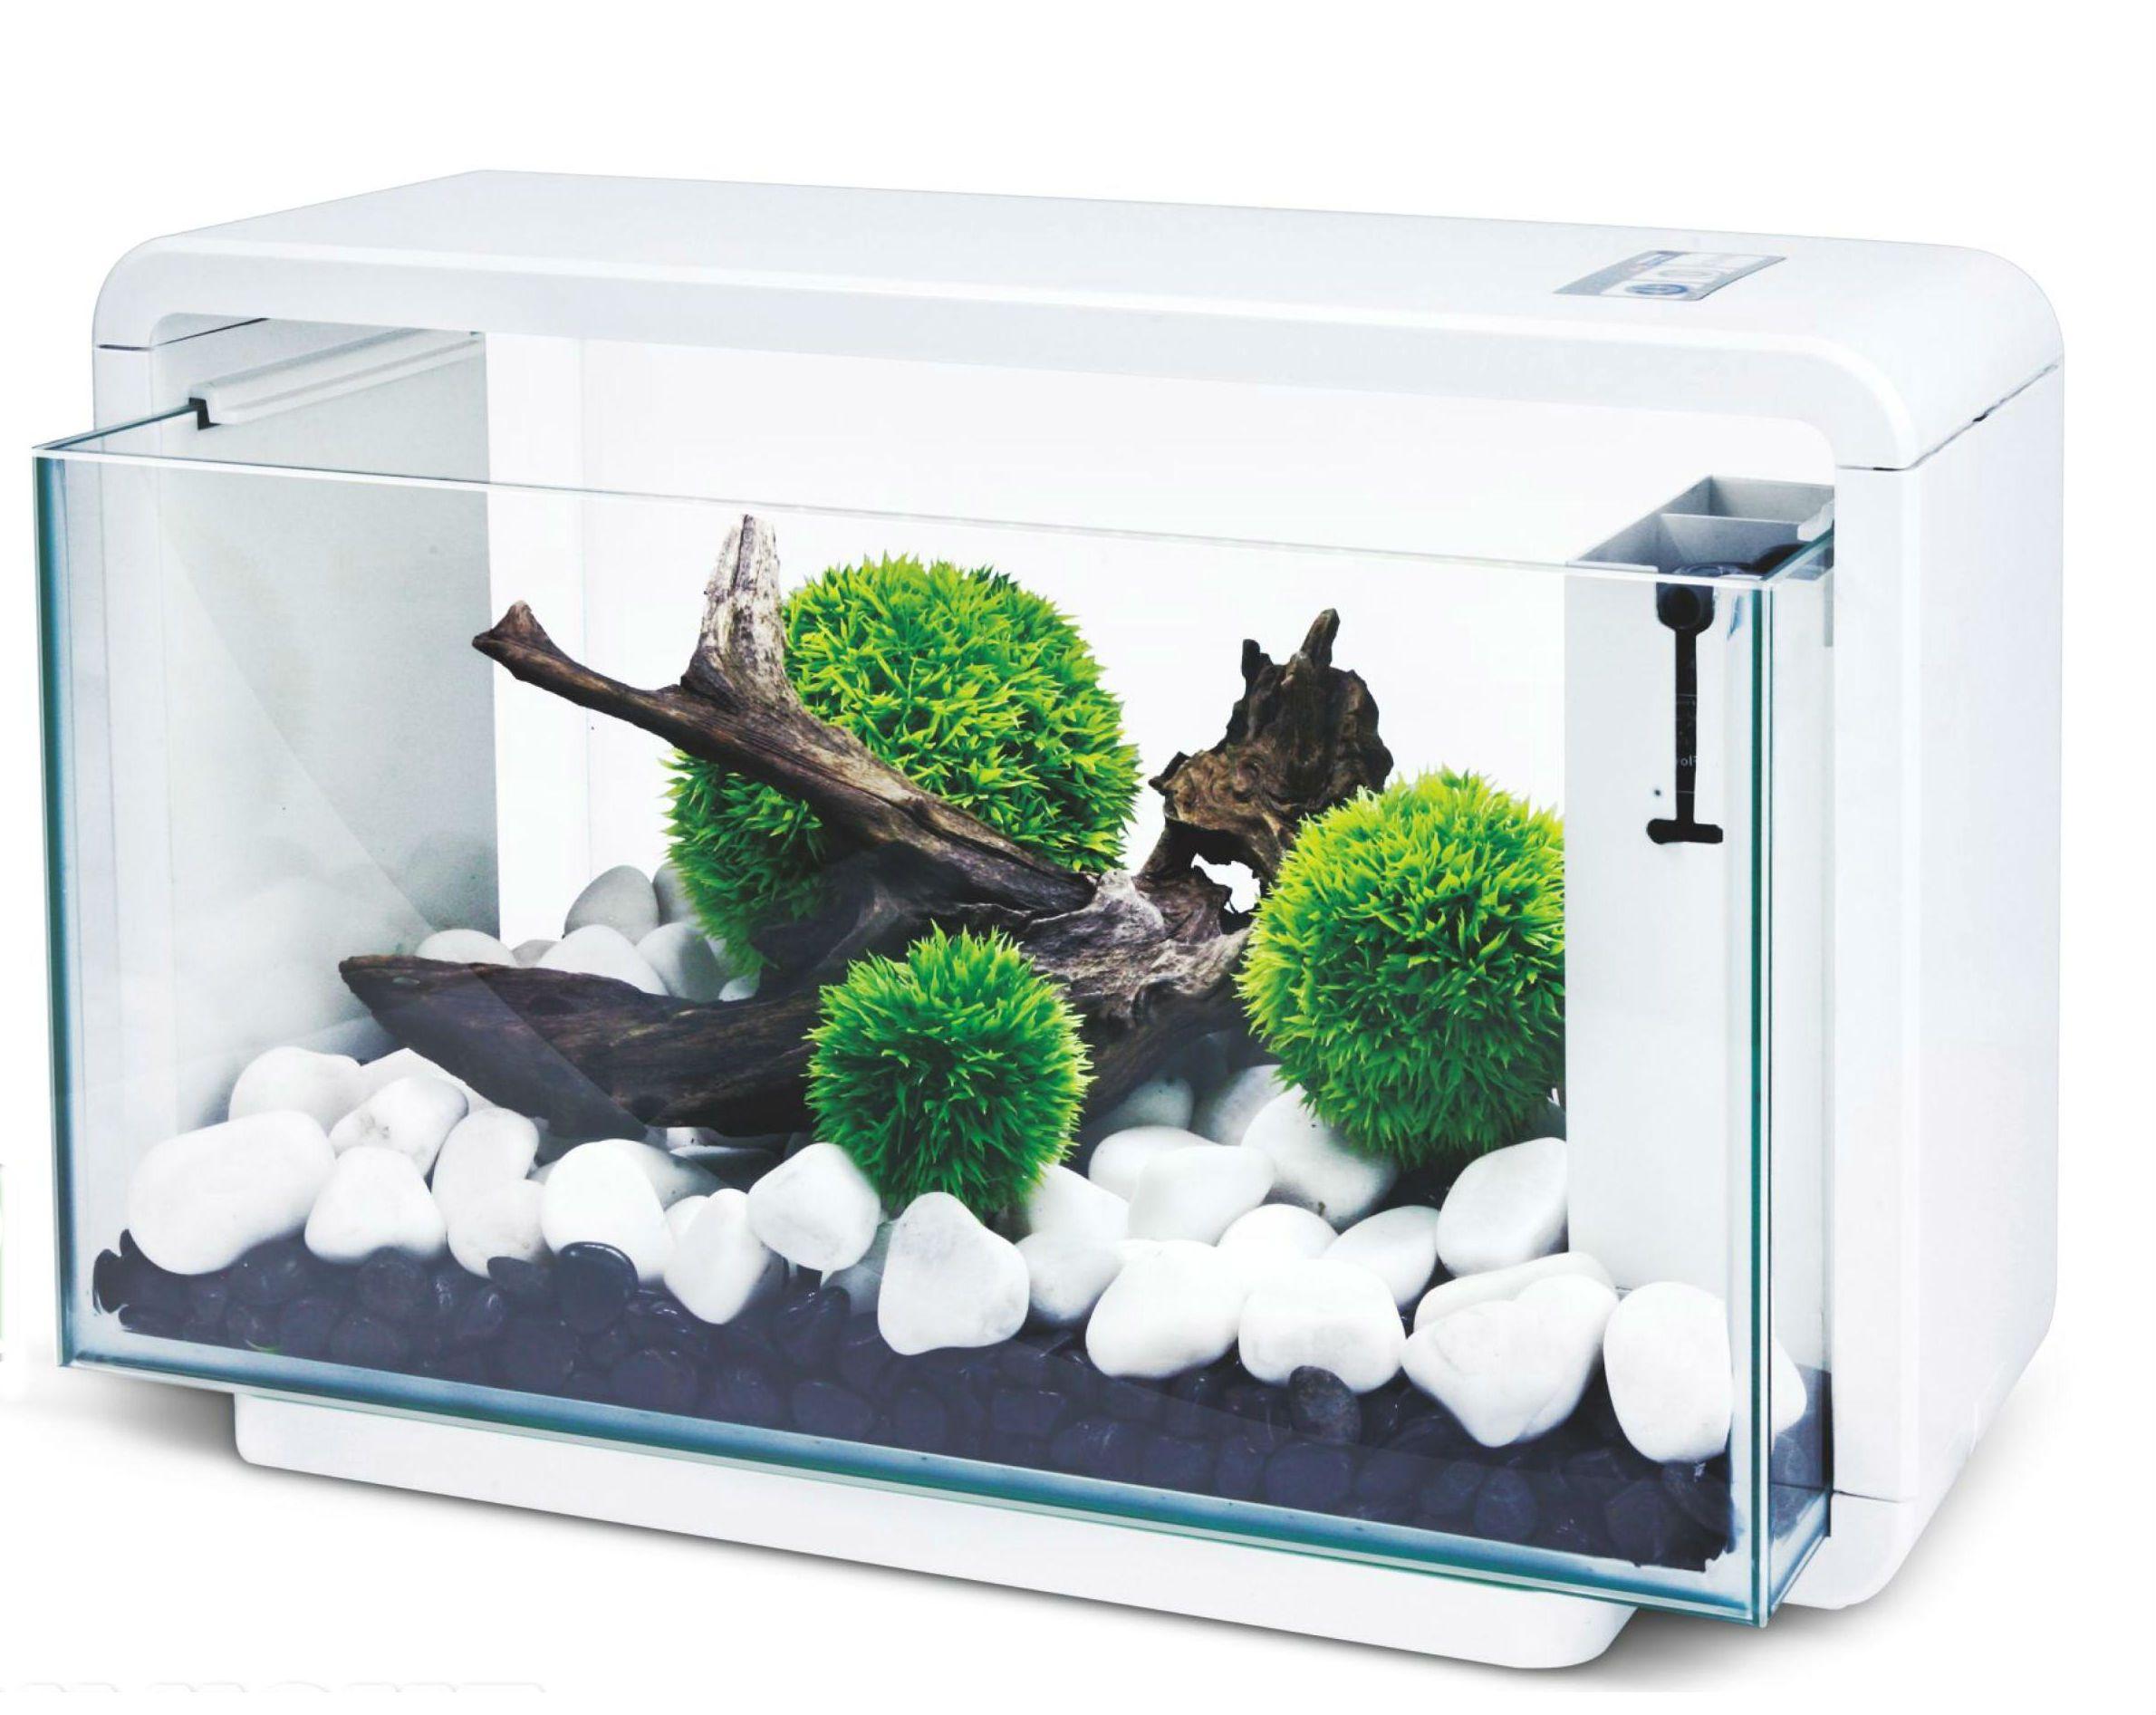 Deco-Tank 25 | Pinterest | Aquariums, Fish tanks and Fish